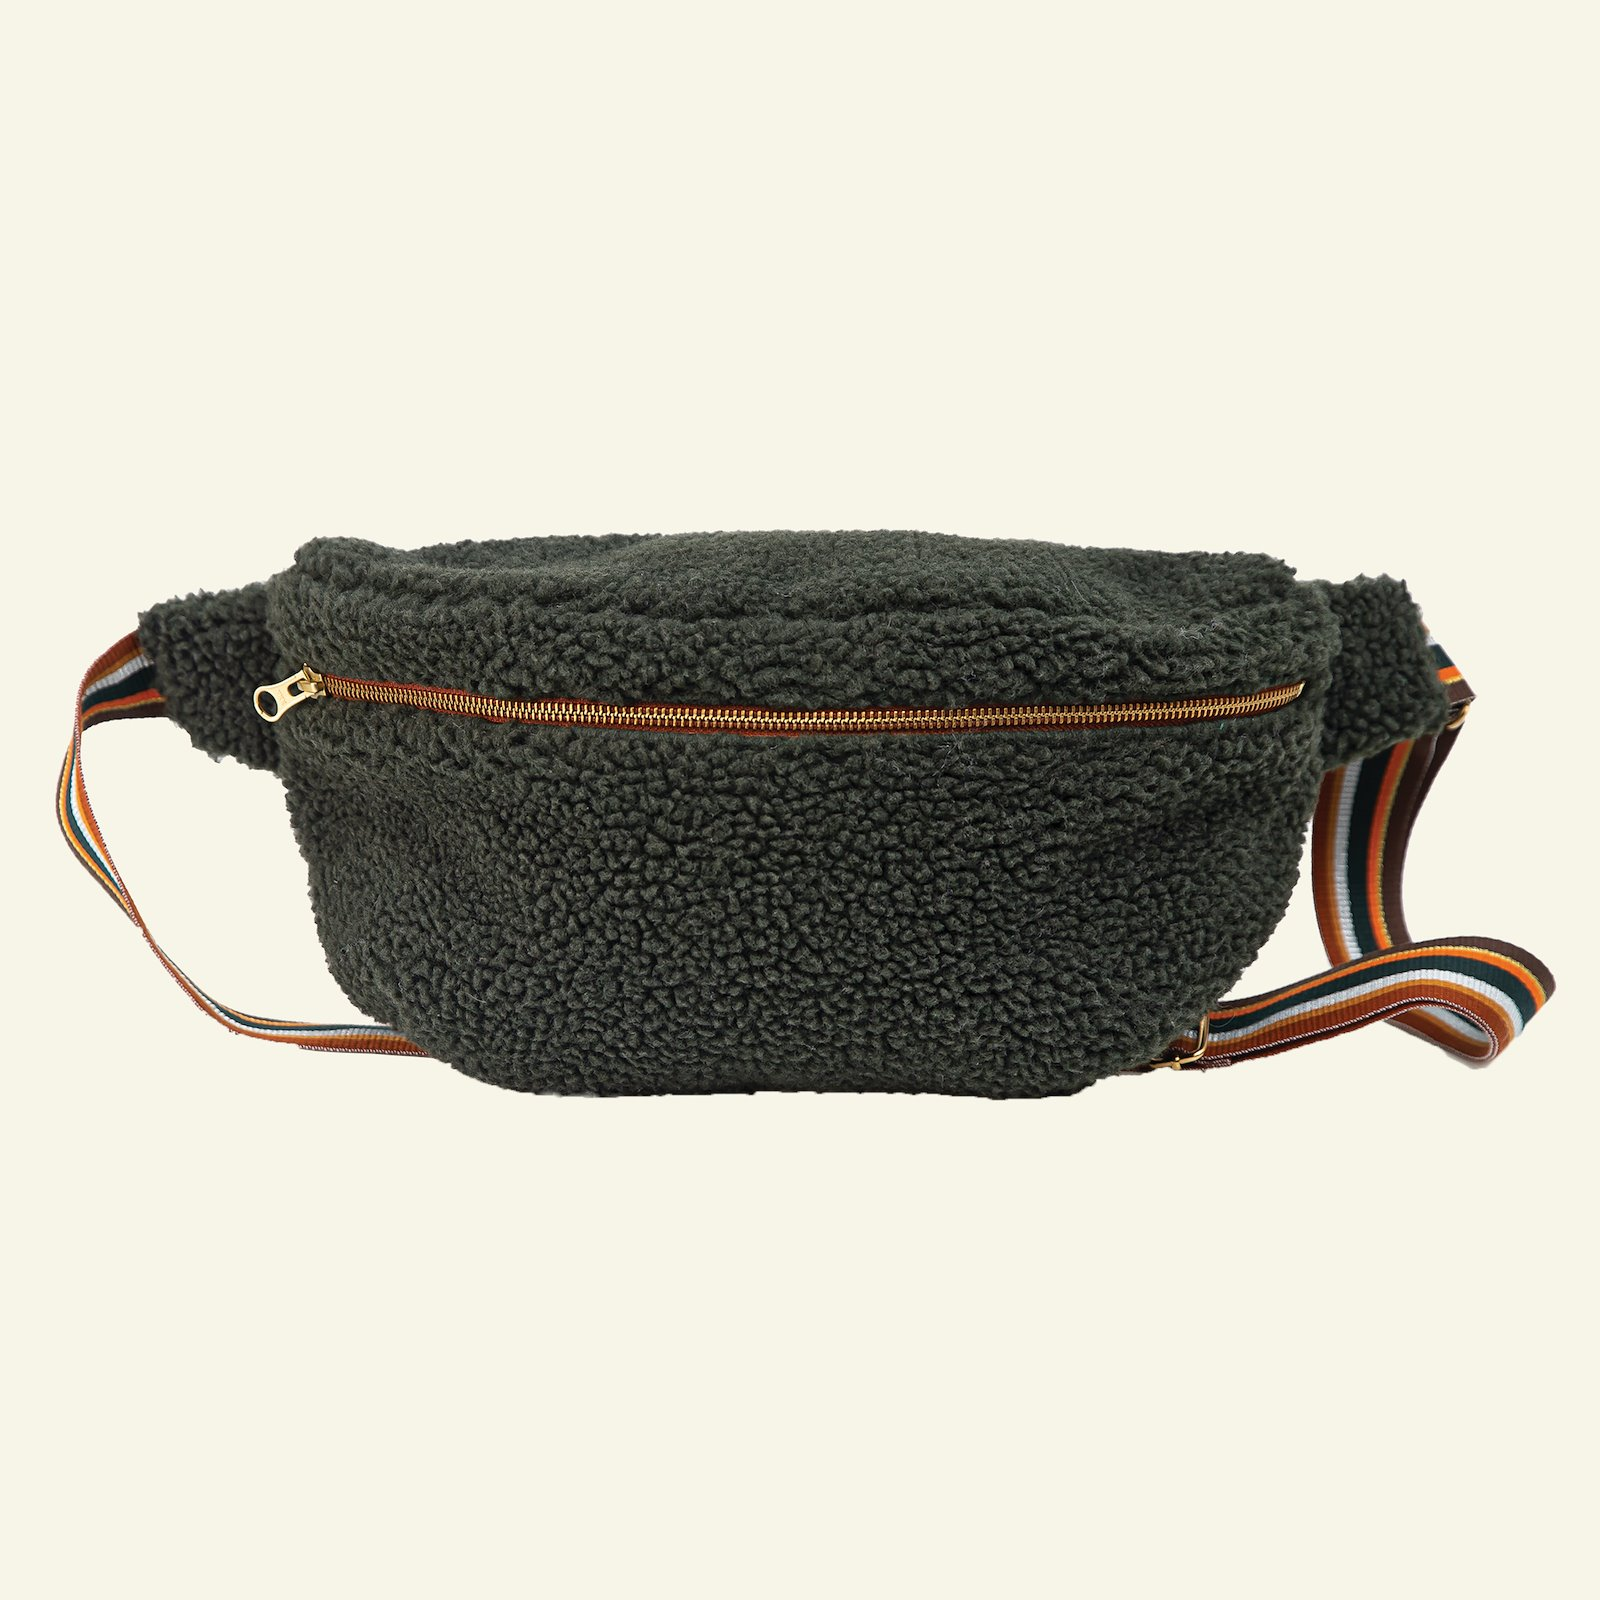 Boxy bum bag p90330_910275_21447_sskit